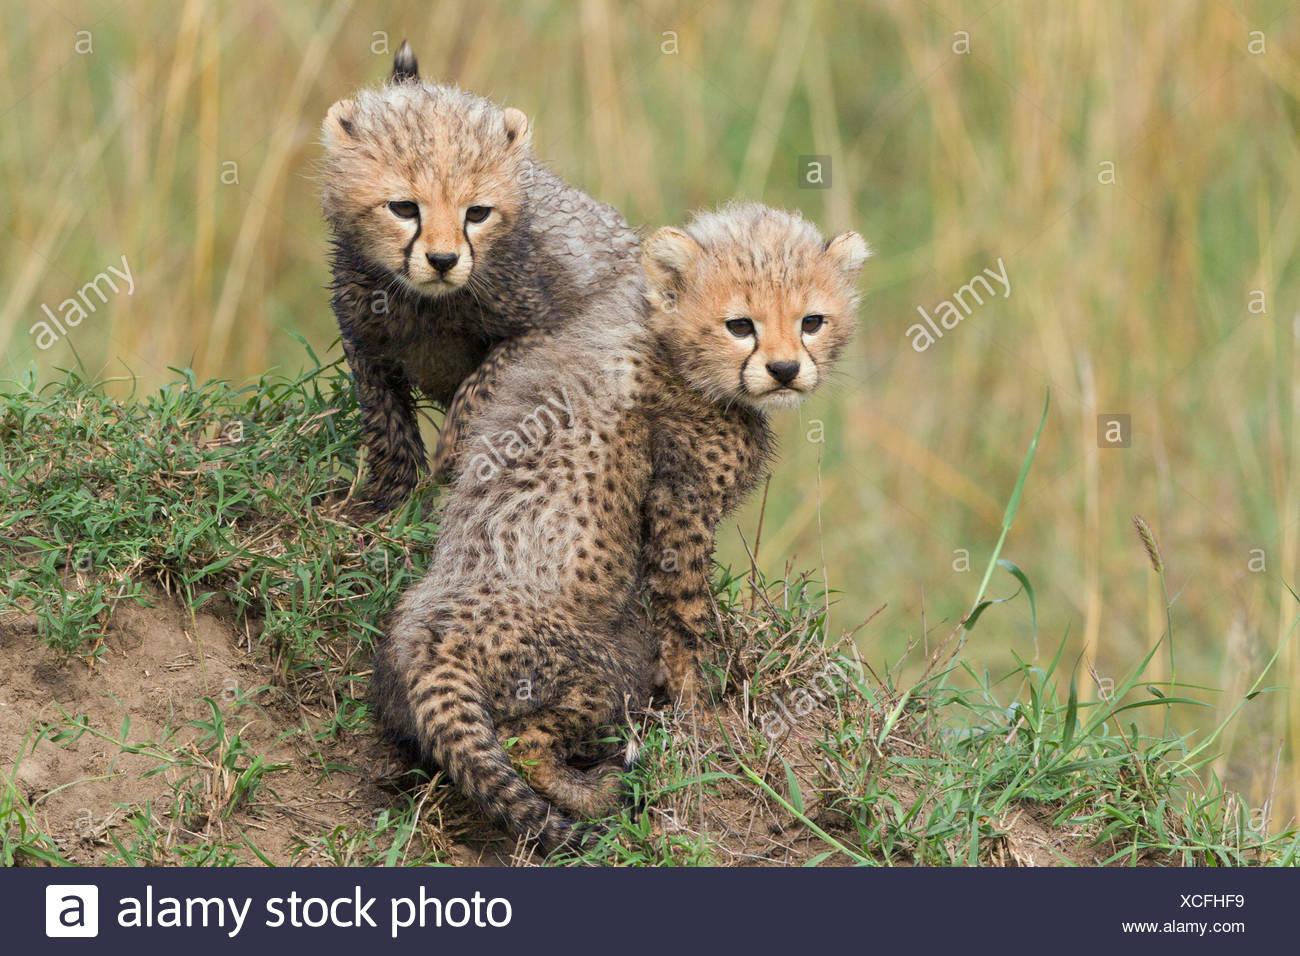 Geparden (Acinonyx Jubatus), jungen, mehrere Wochen, Massai Mara, Serengeti, Provinz Rift Valley, Kenia Stockbild